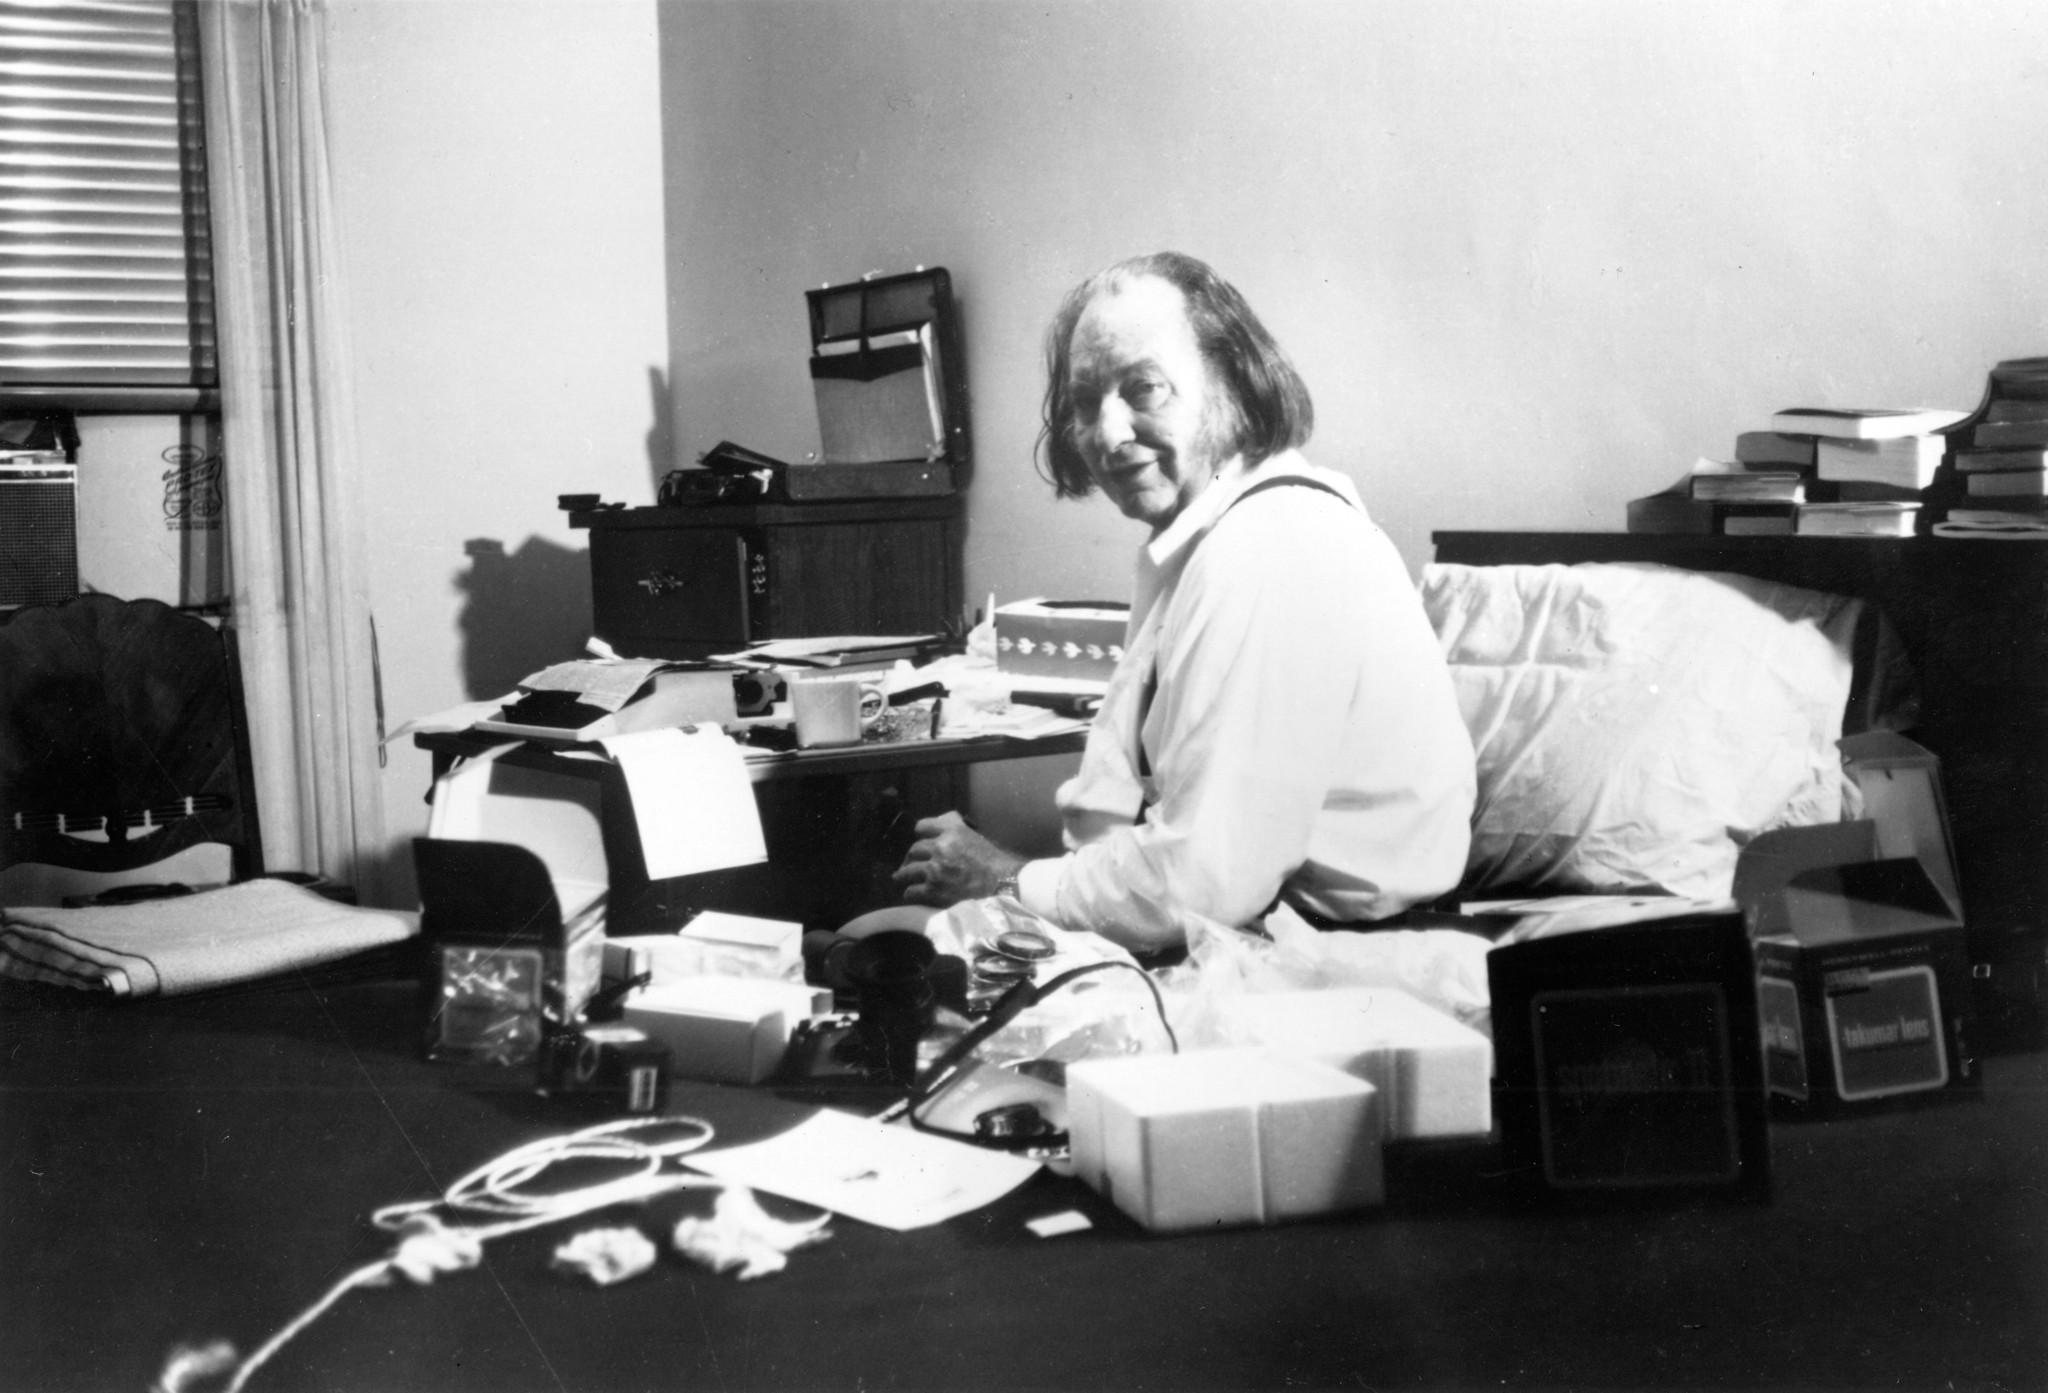 la-et-jc-97-years-of-typewriters-20130711-015